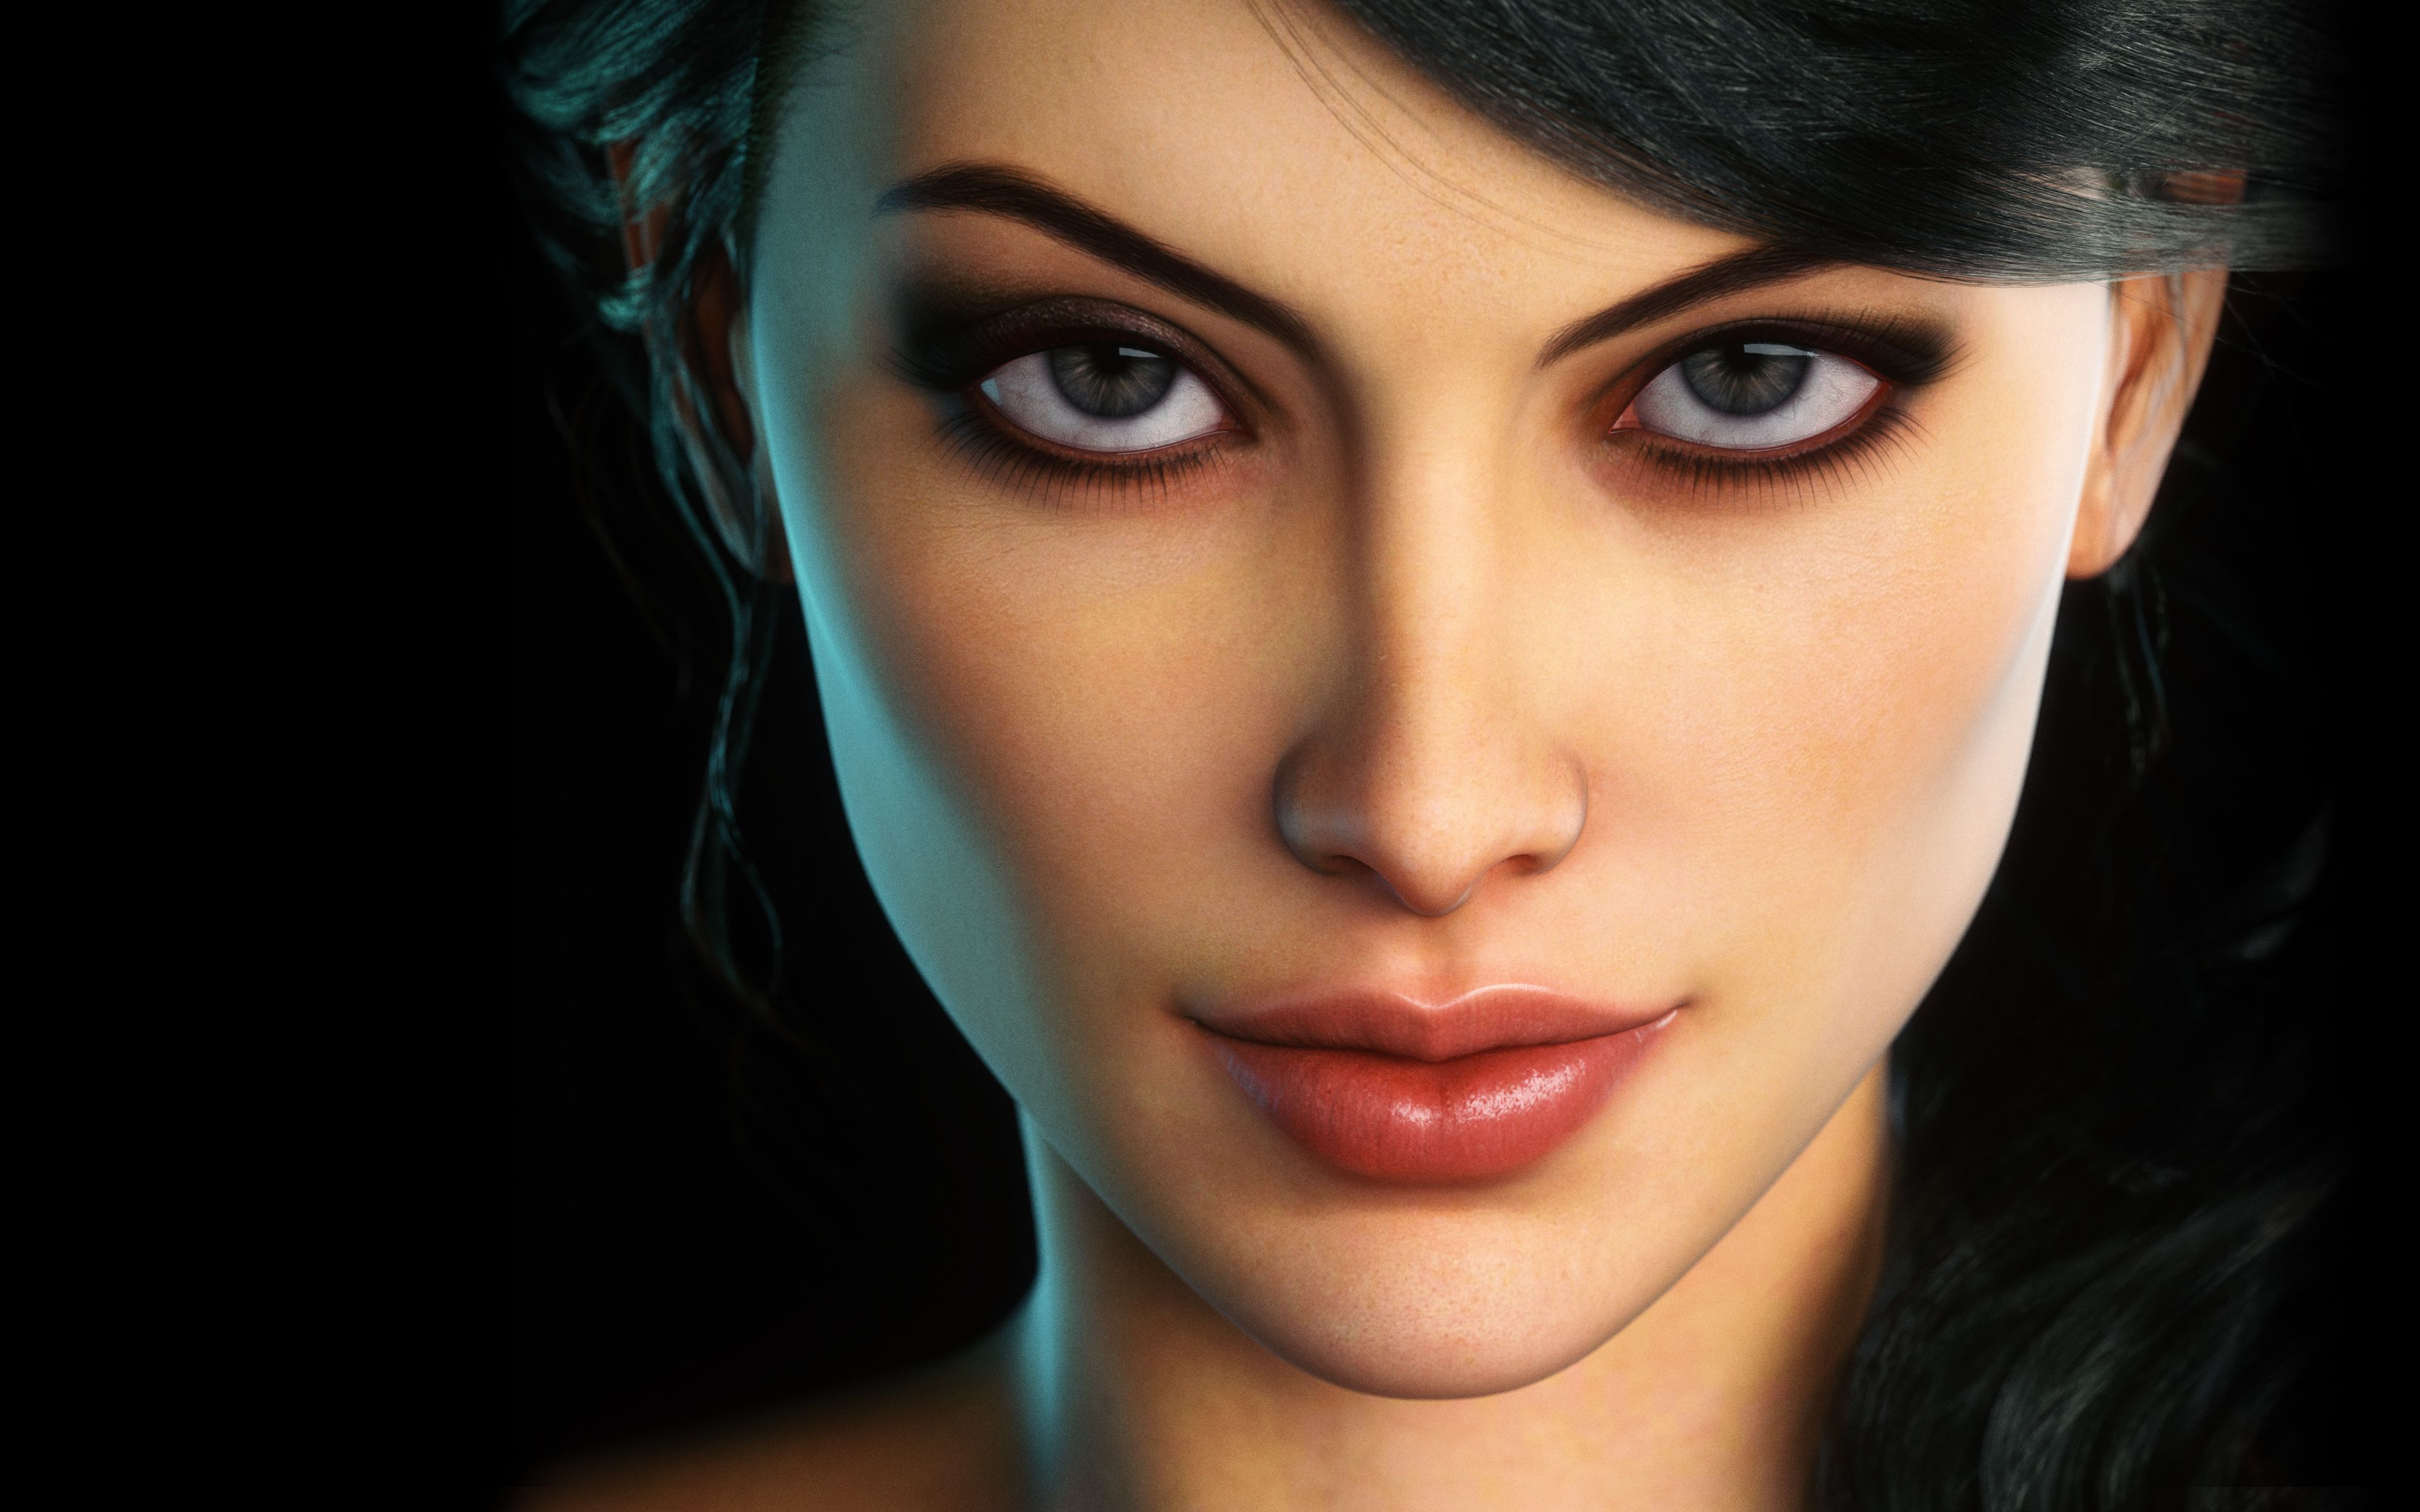 glamorous woman hd desktop wallpaper high definition | wallpapers